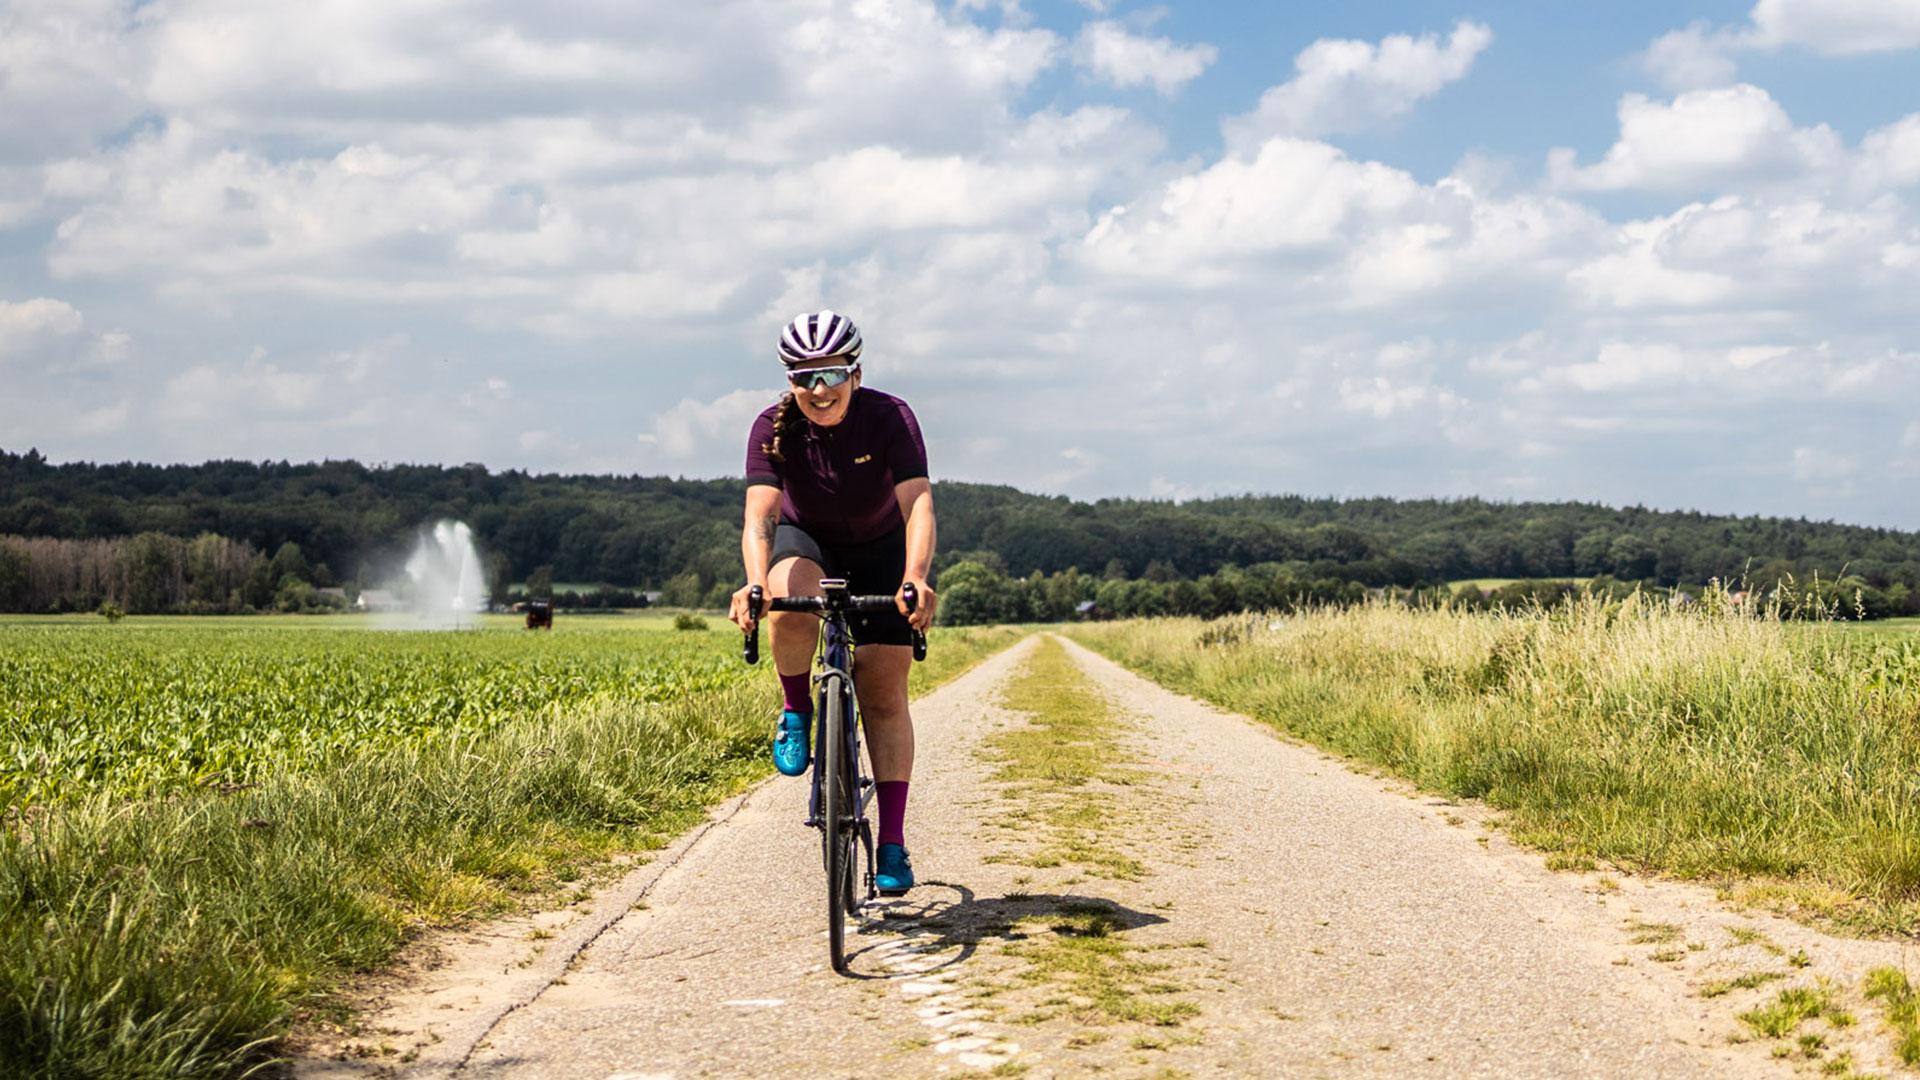 Beginnen met wielrennen of mountainbiken? 5 Tips om je op weg te helpen